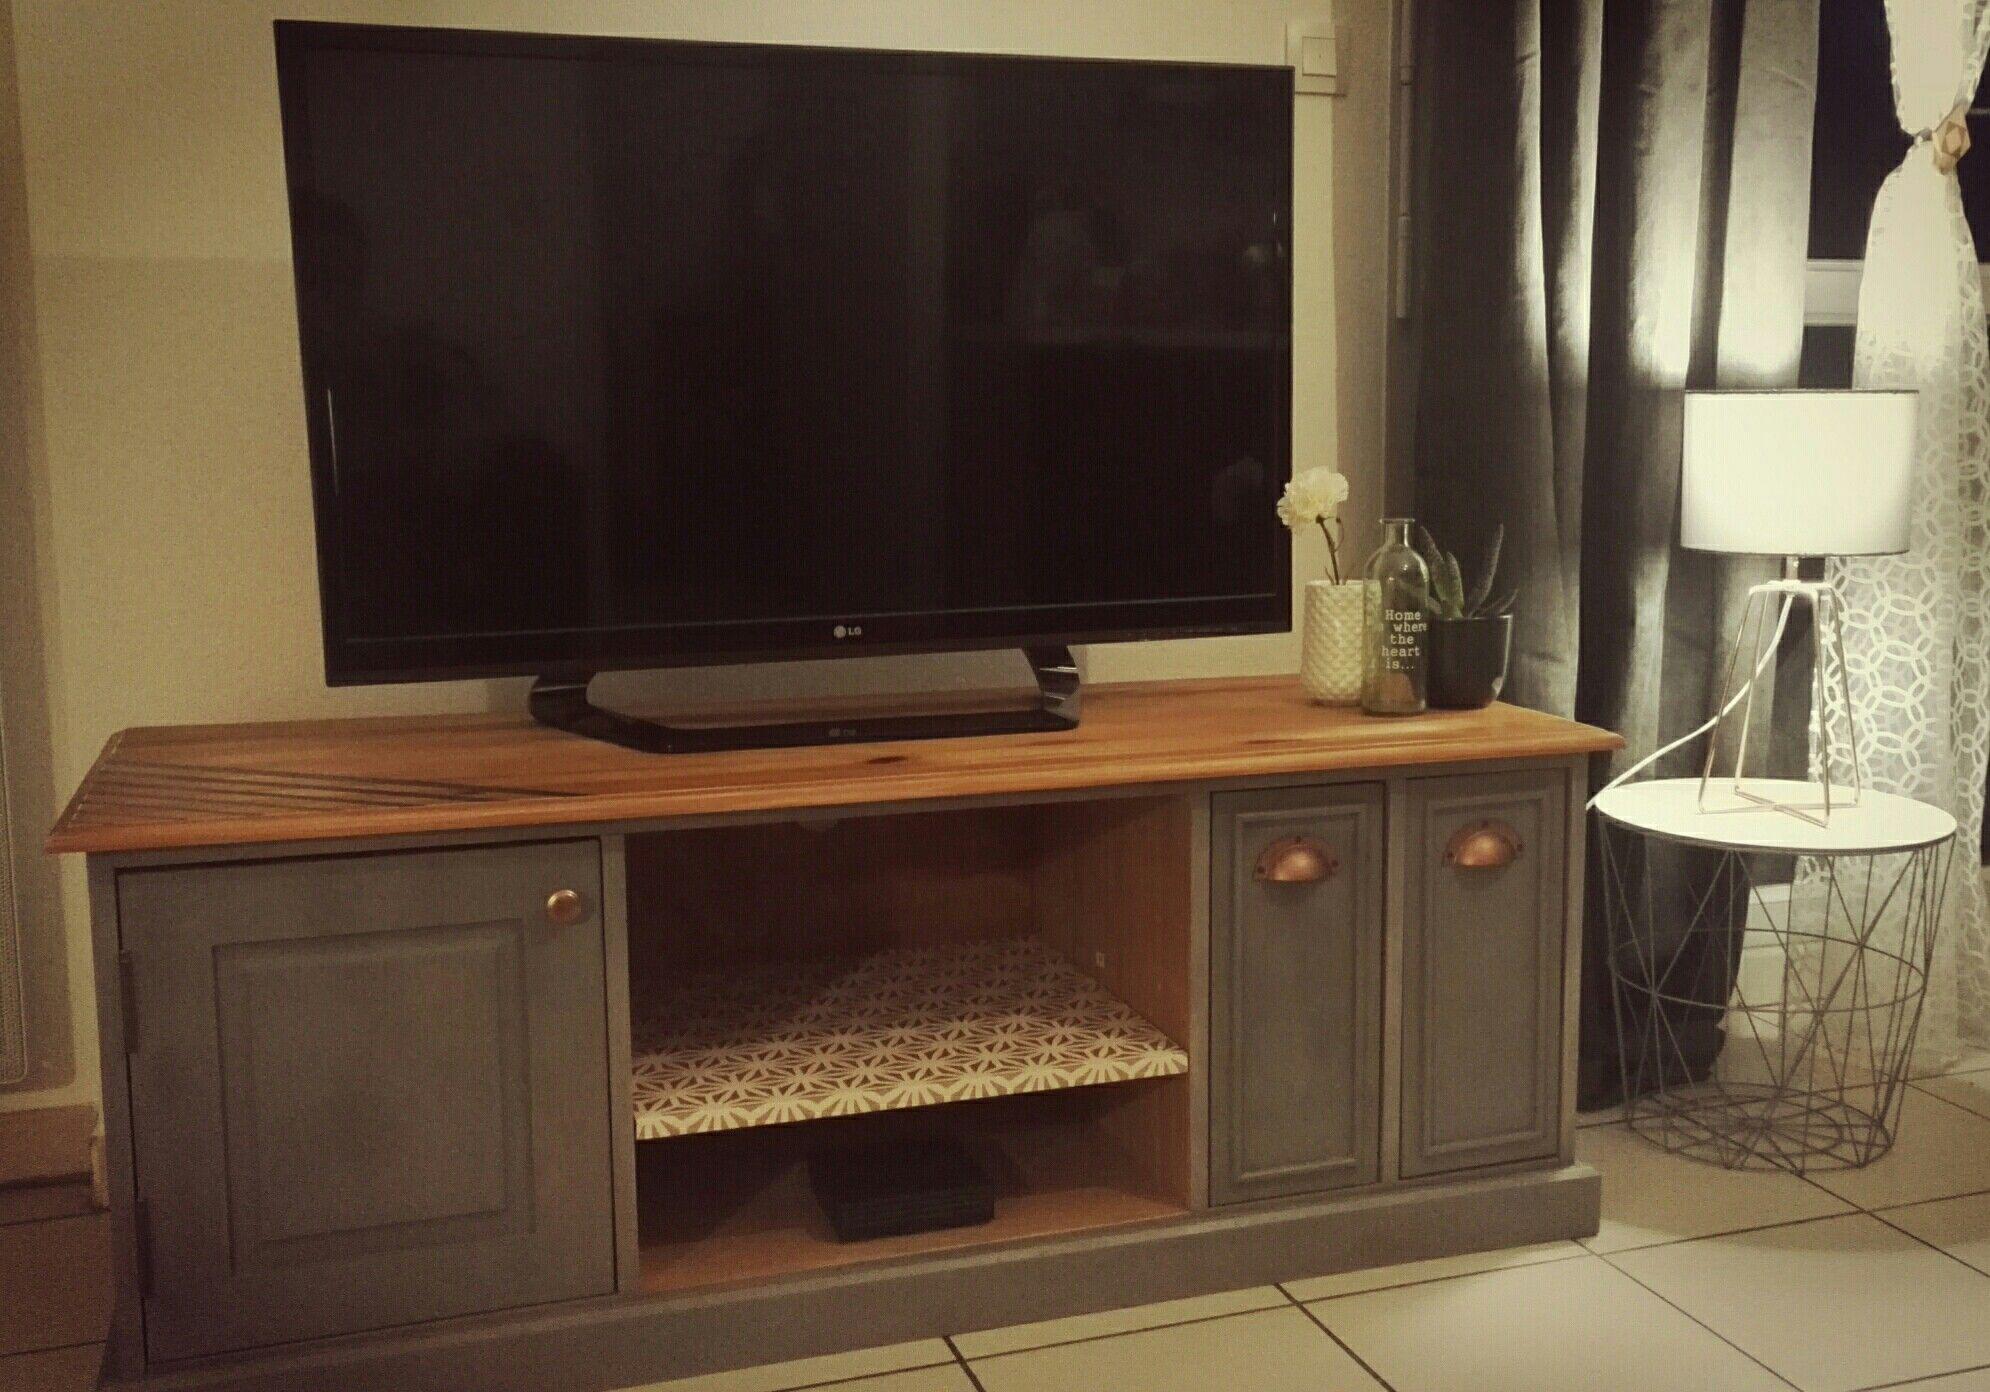 Meuble Tv Pin Massif Modele Chiffonnier Relooke En Greywash Peinture Craie Et Motifs Graphiques Relooker Meuble Meuble Tv Mobilier De Salon